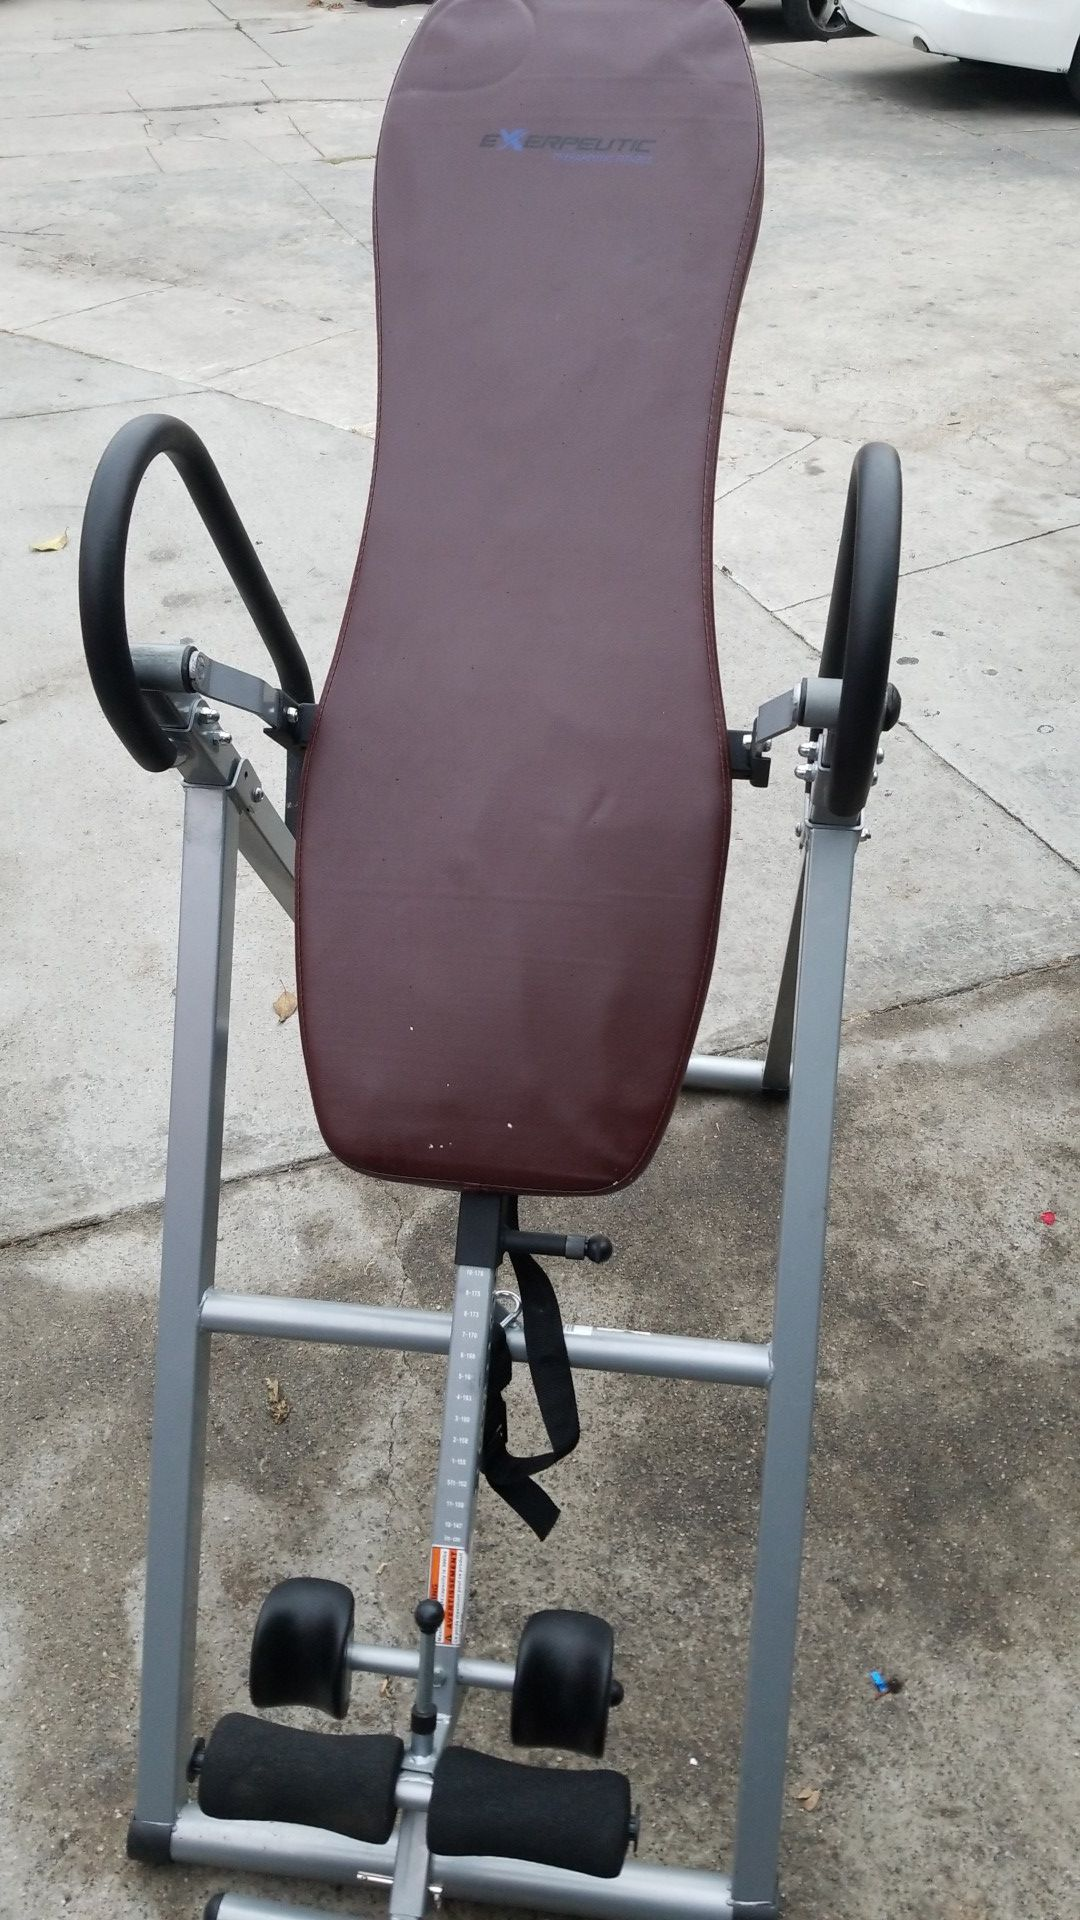 Exerpeutic therapeutic fitness NEW